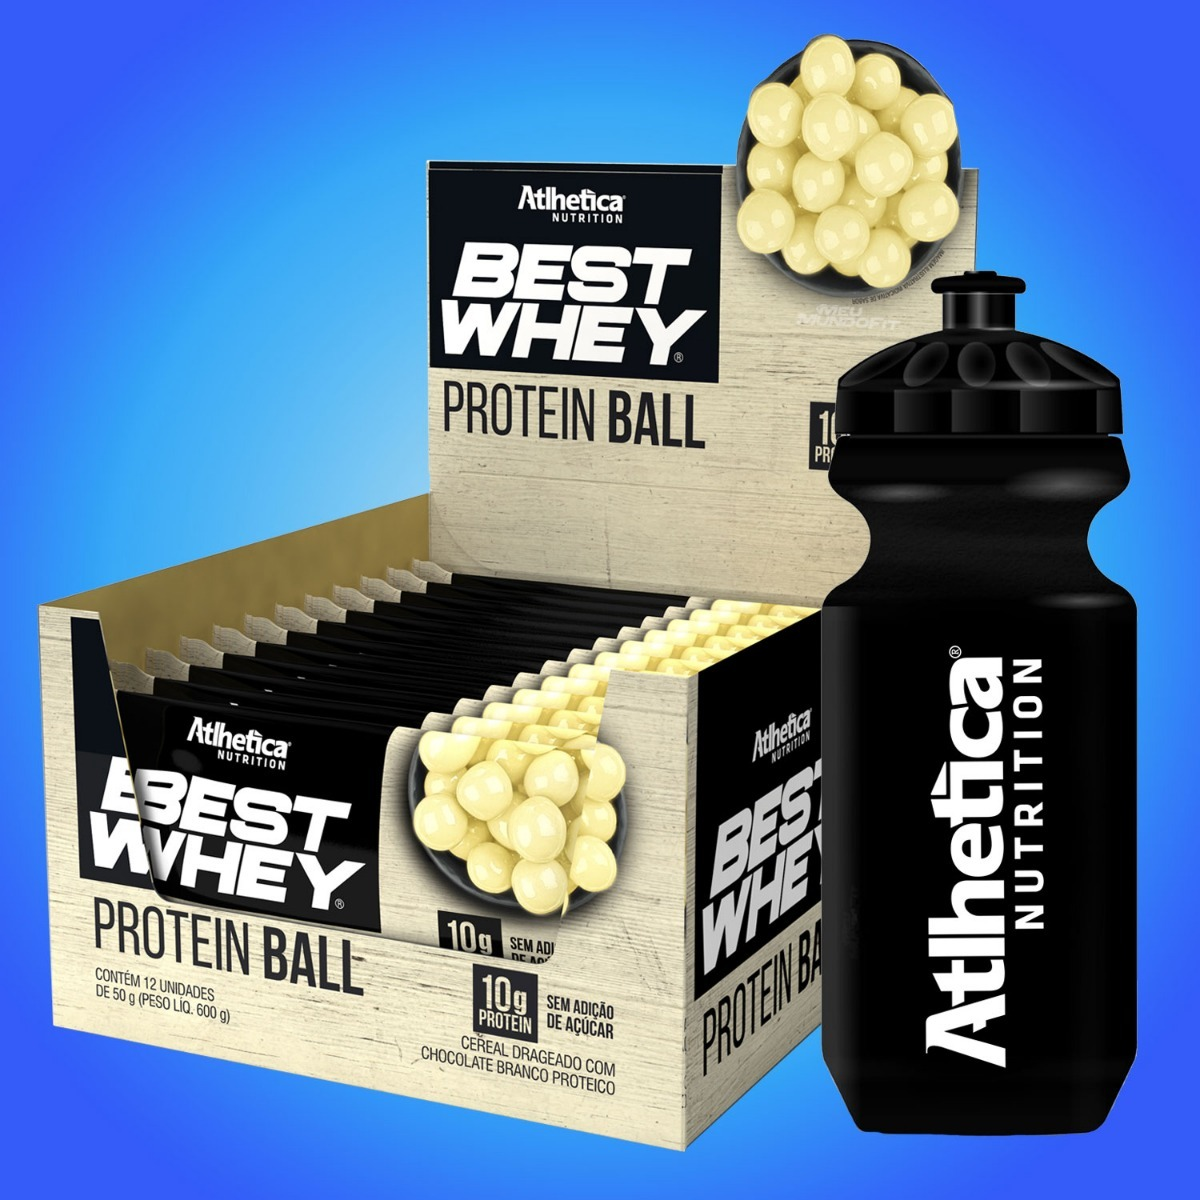 3edcf0906 best whey protein ball (12 un.50g) atlhetica nutrition. Carregando zoom.